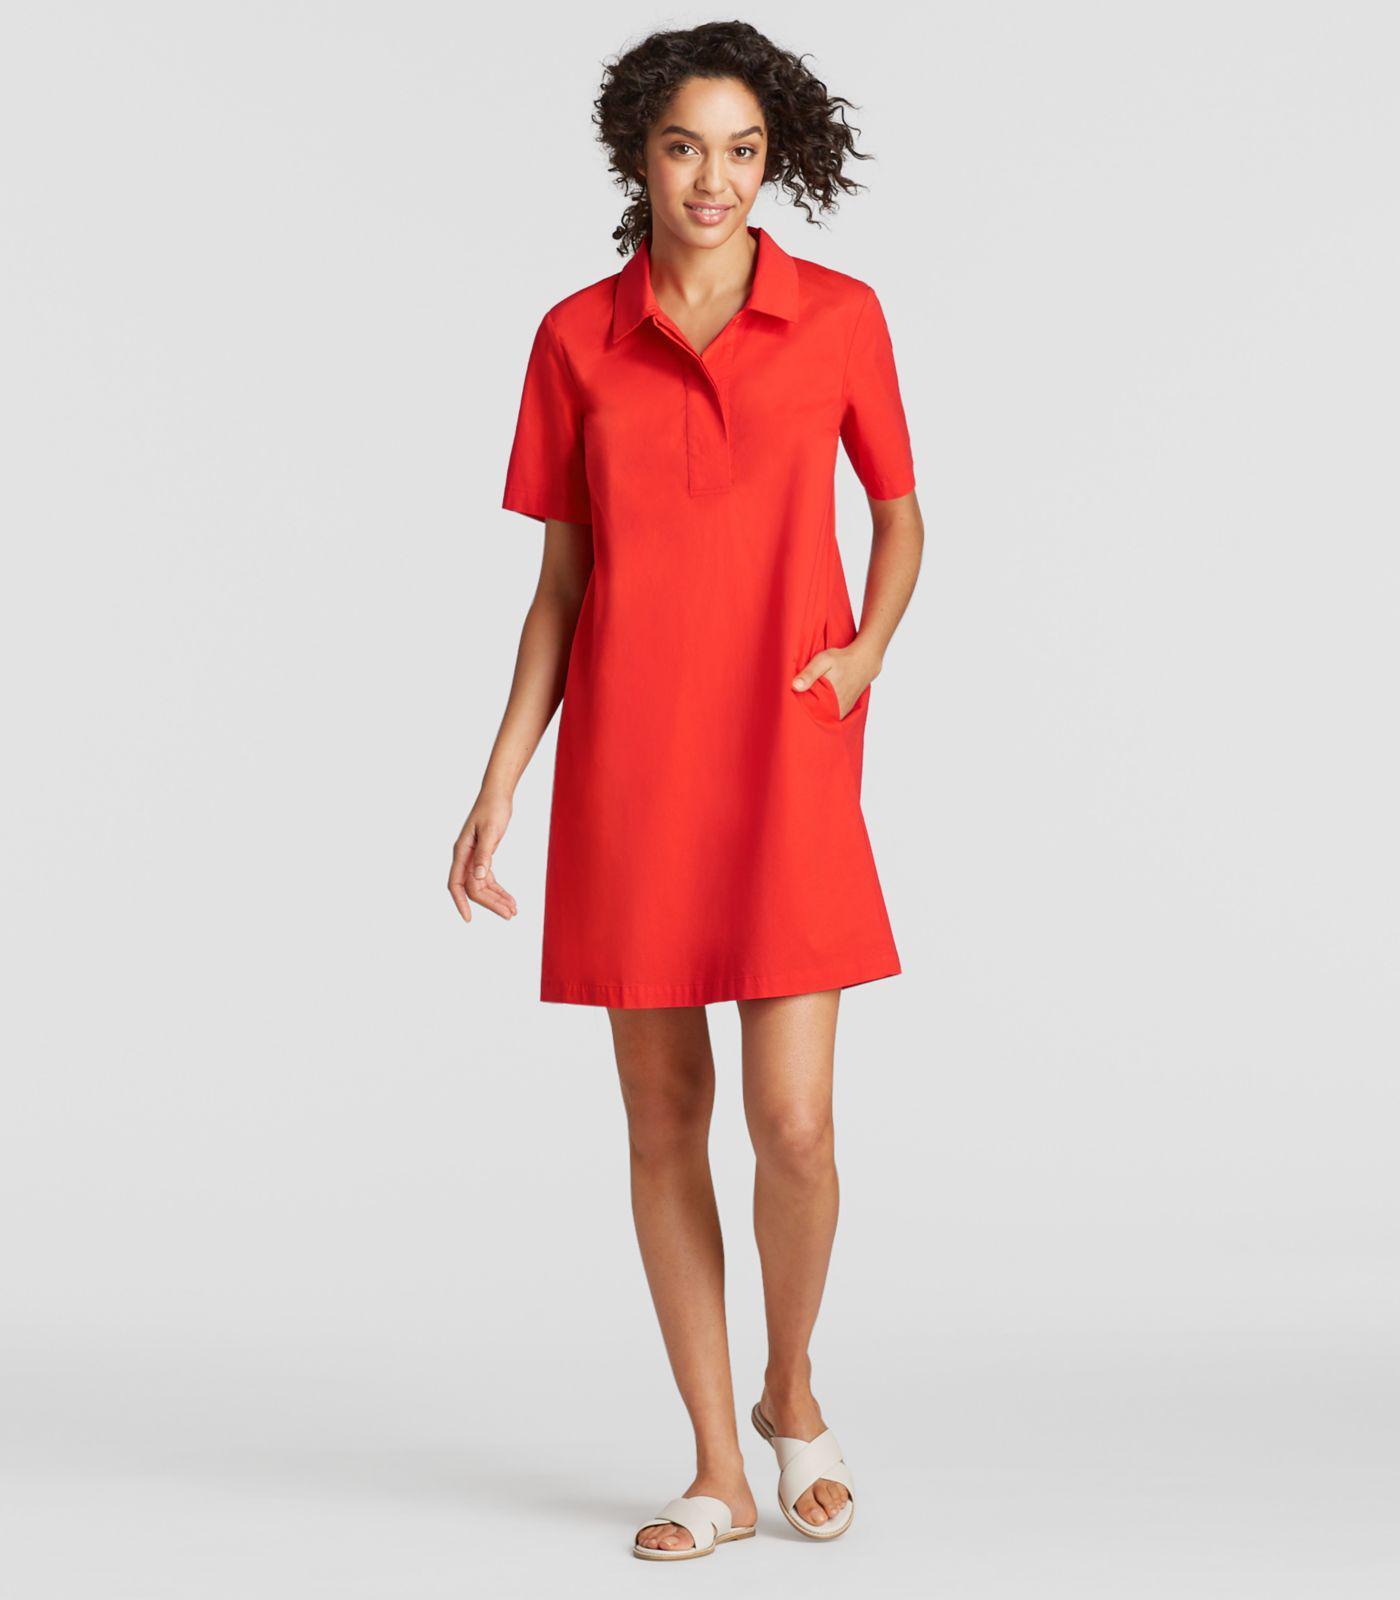 59beca4a757 Lyst - Eileen Fisher Plus Size Organic Cotton Poplin Shirt Dress in Red